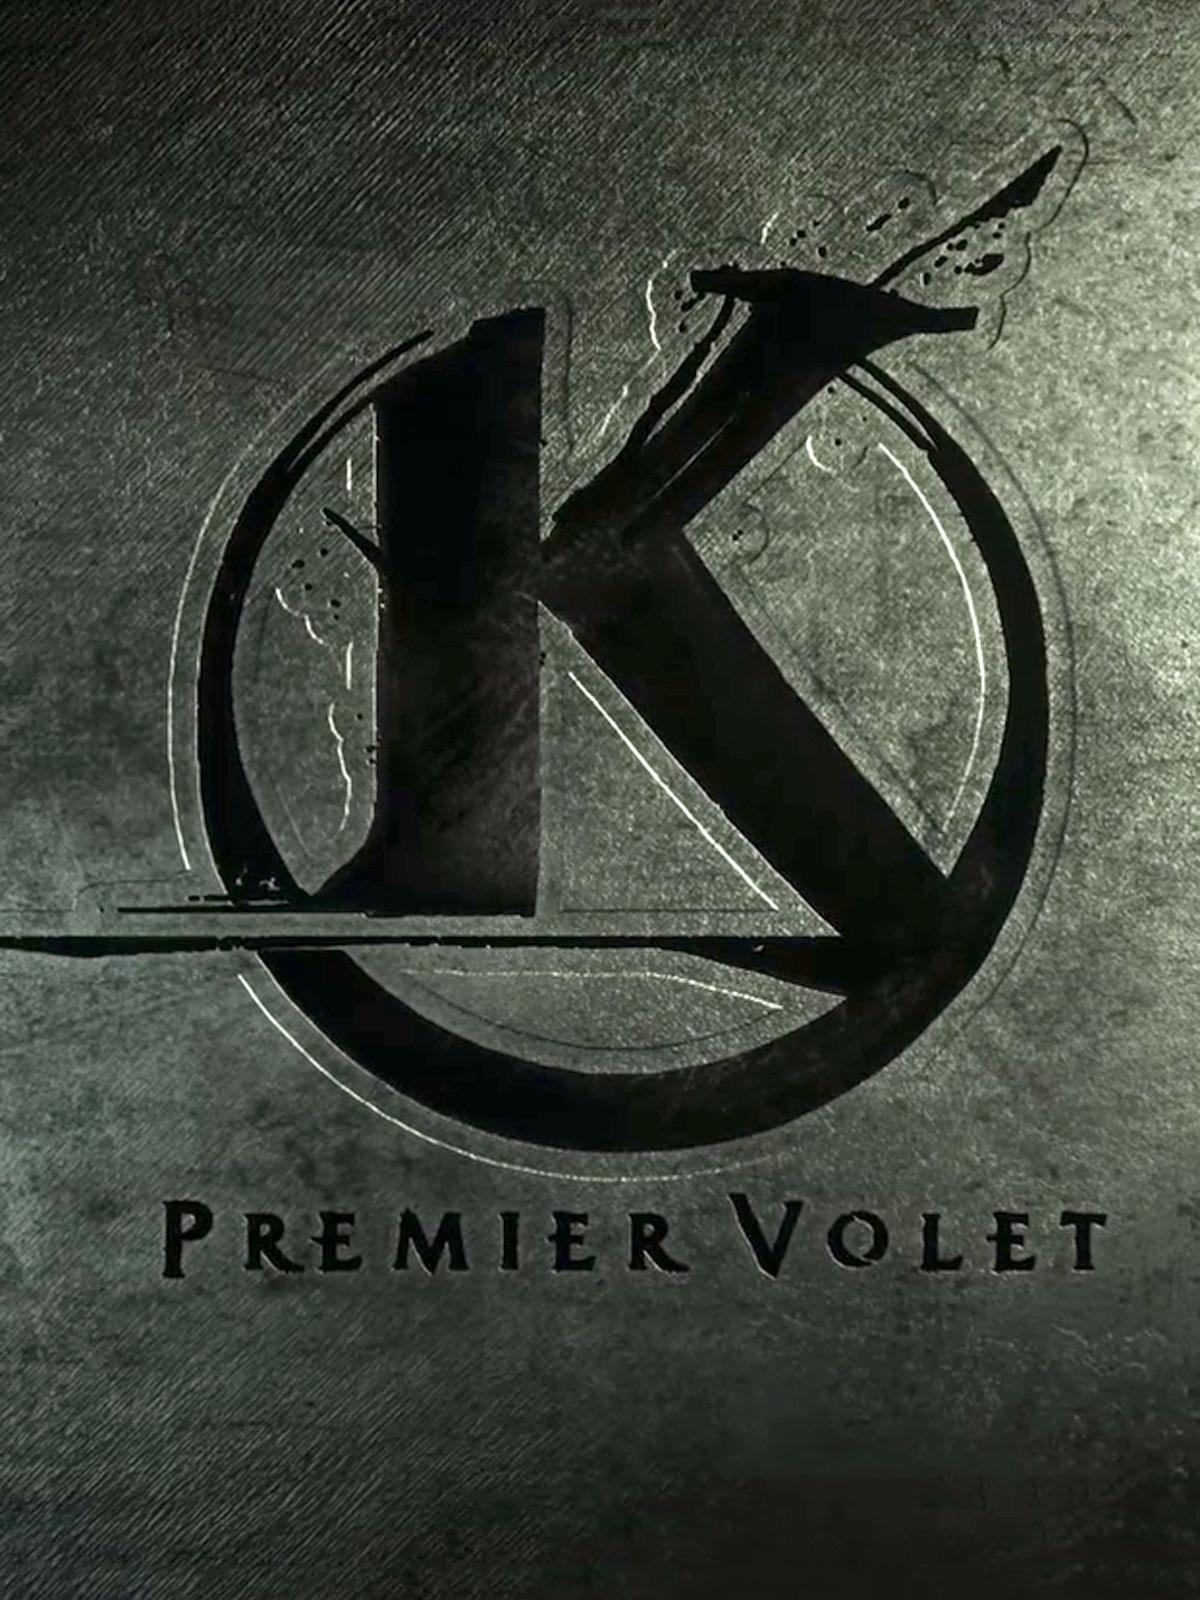 Kaamelott – Premier volet streaming